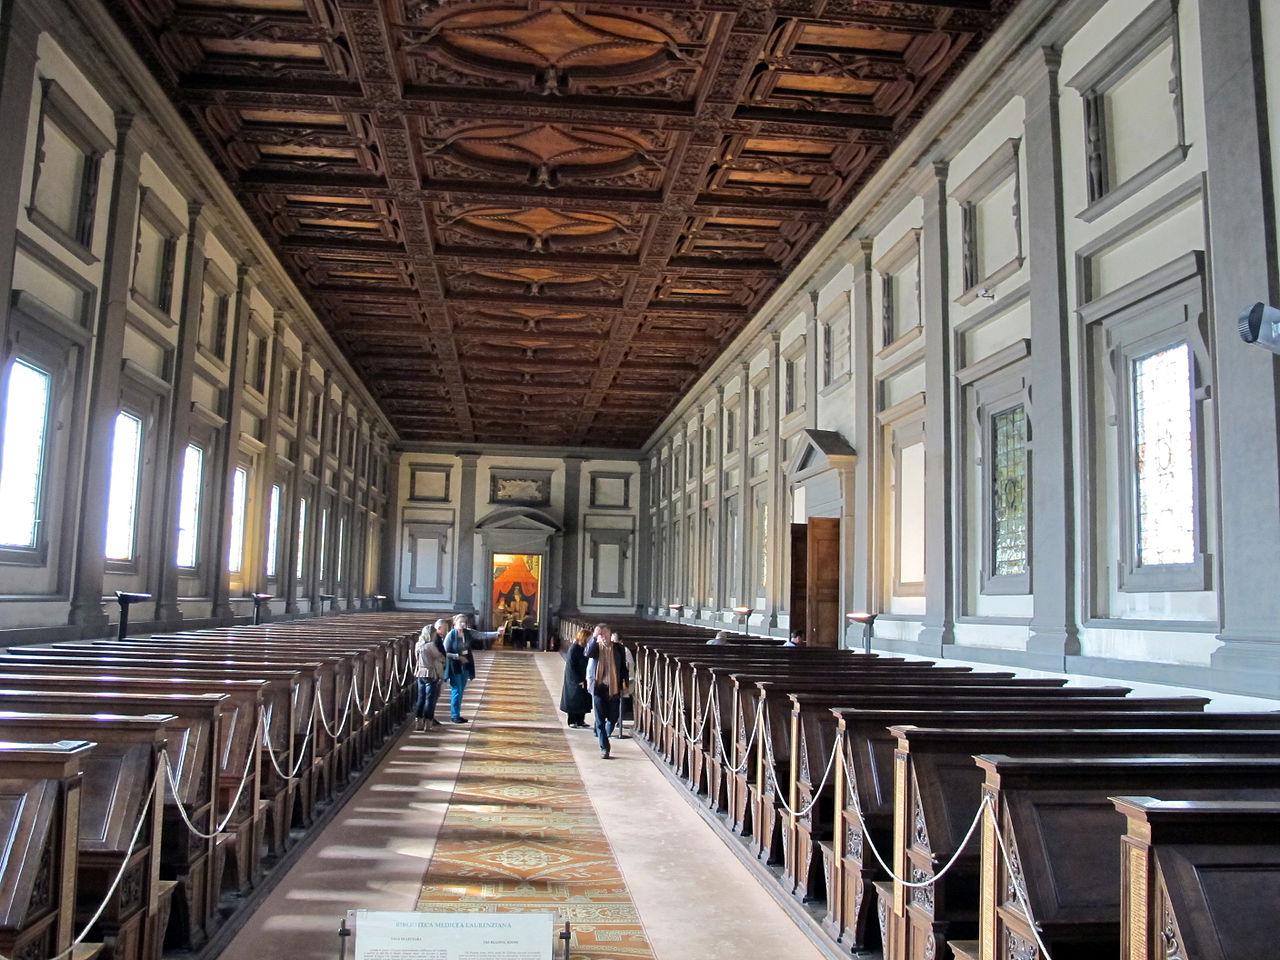 File:Biblioteca laurenziana, sala lettura 04.JPG ...